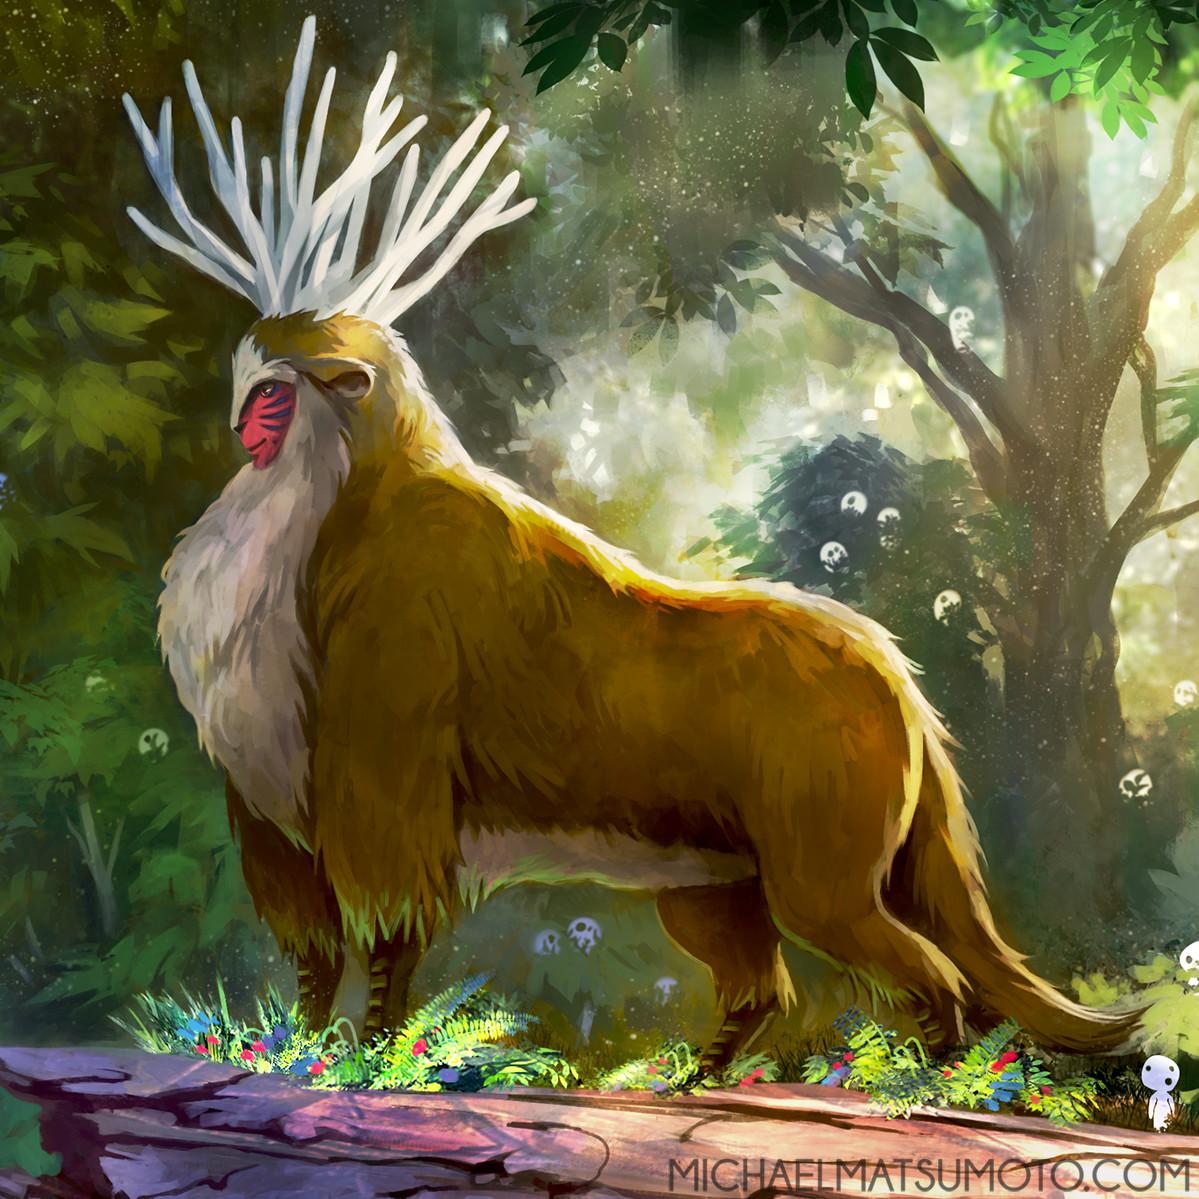 Michael matsumoto forest spirit web detail 02